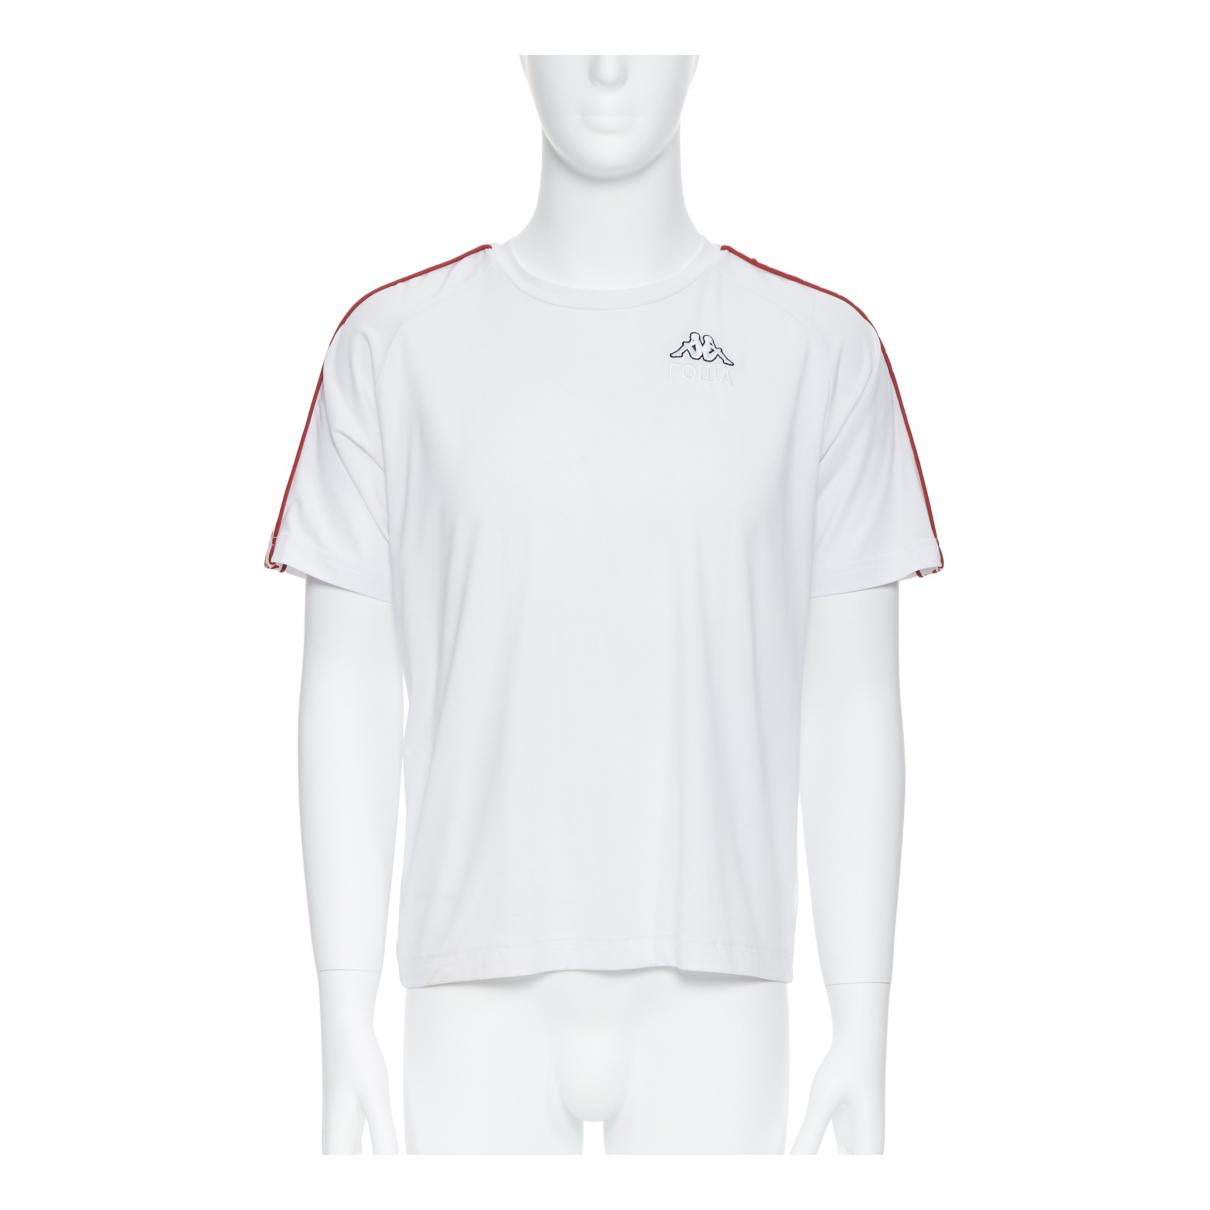 Gosha Rubchinskiy - Tee shirts   pour homme en coton - blanc